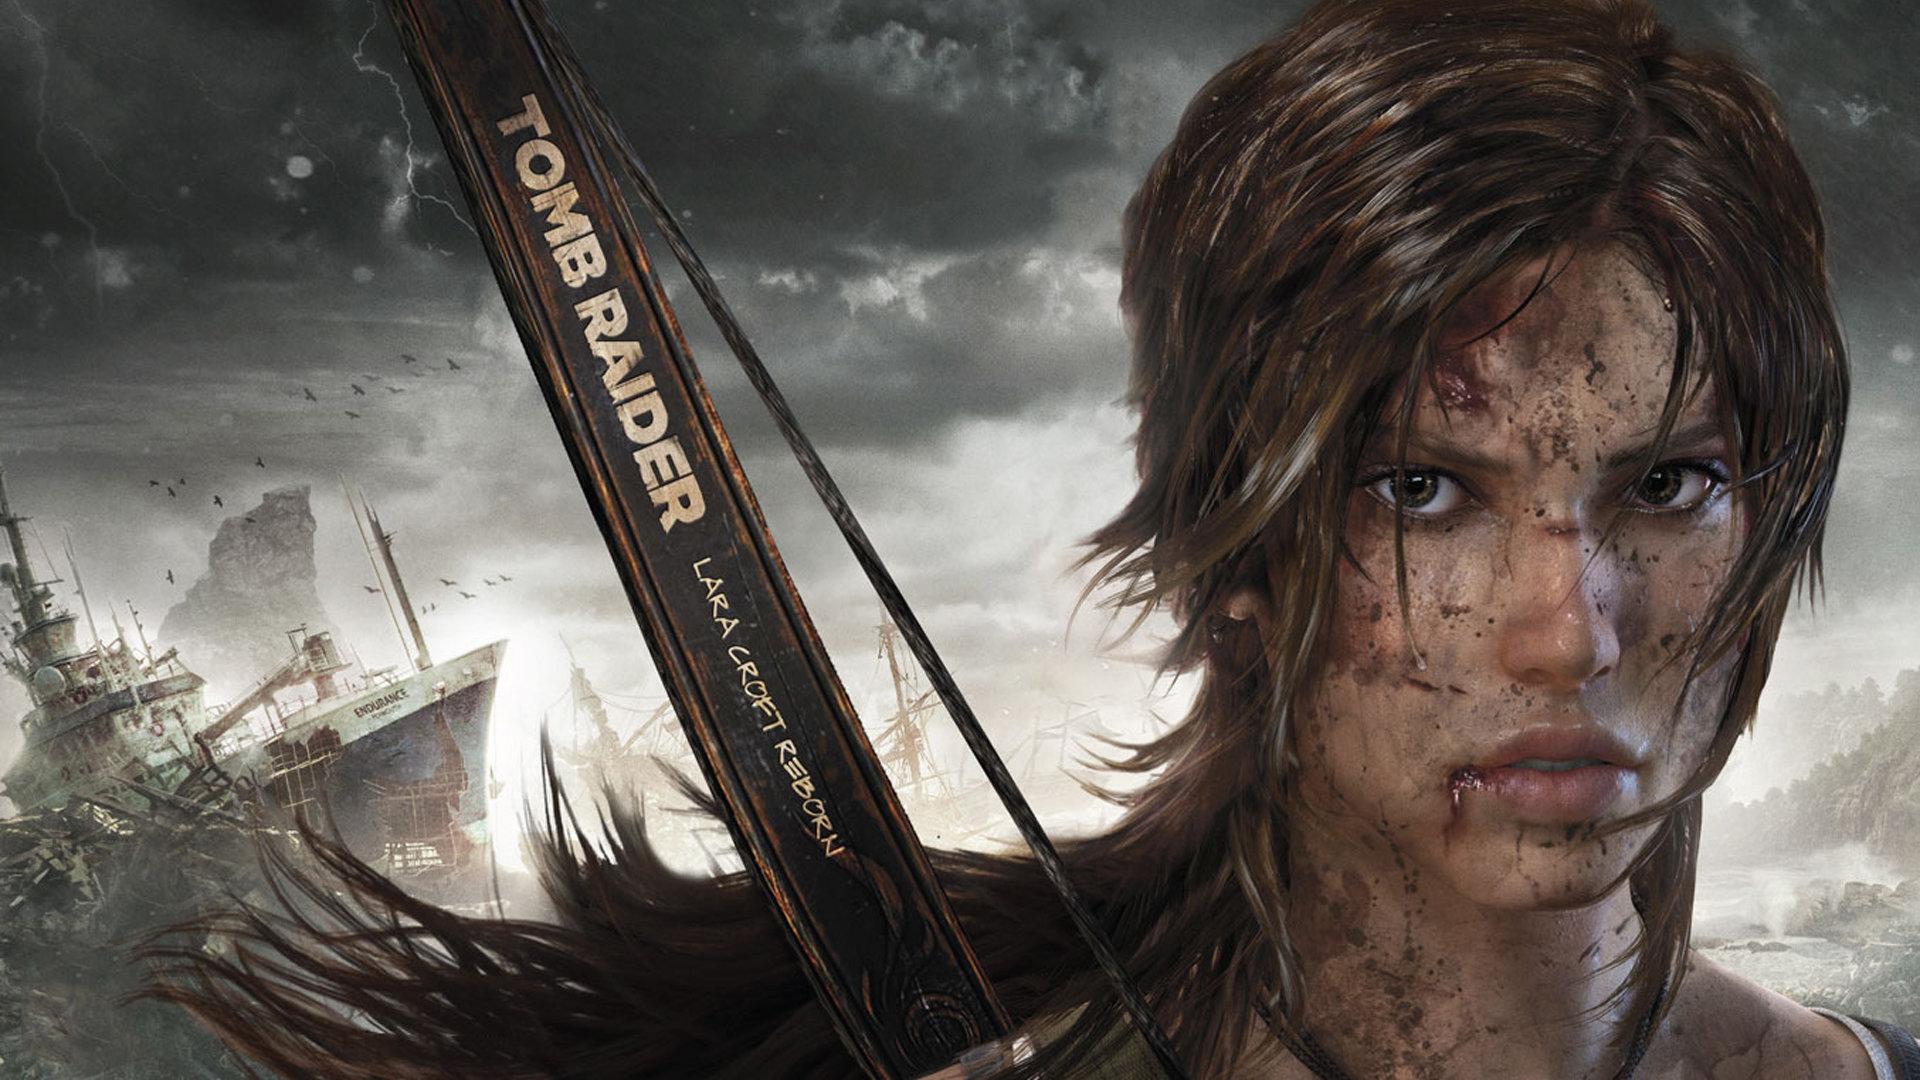 Tomb Raider 2013 Wallpapers 1920x1080 Full Hd 1080p Desktop Backgrounds